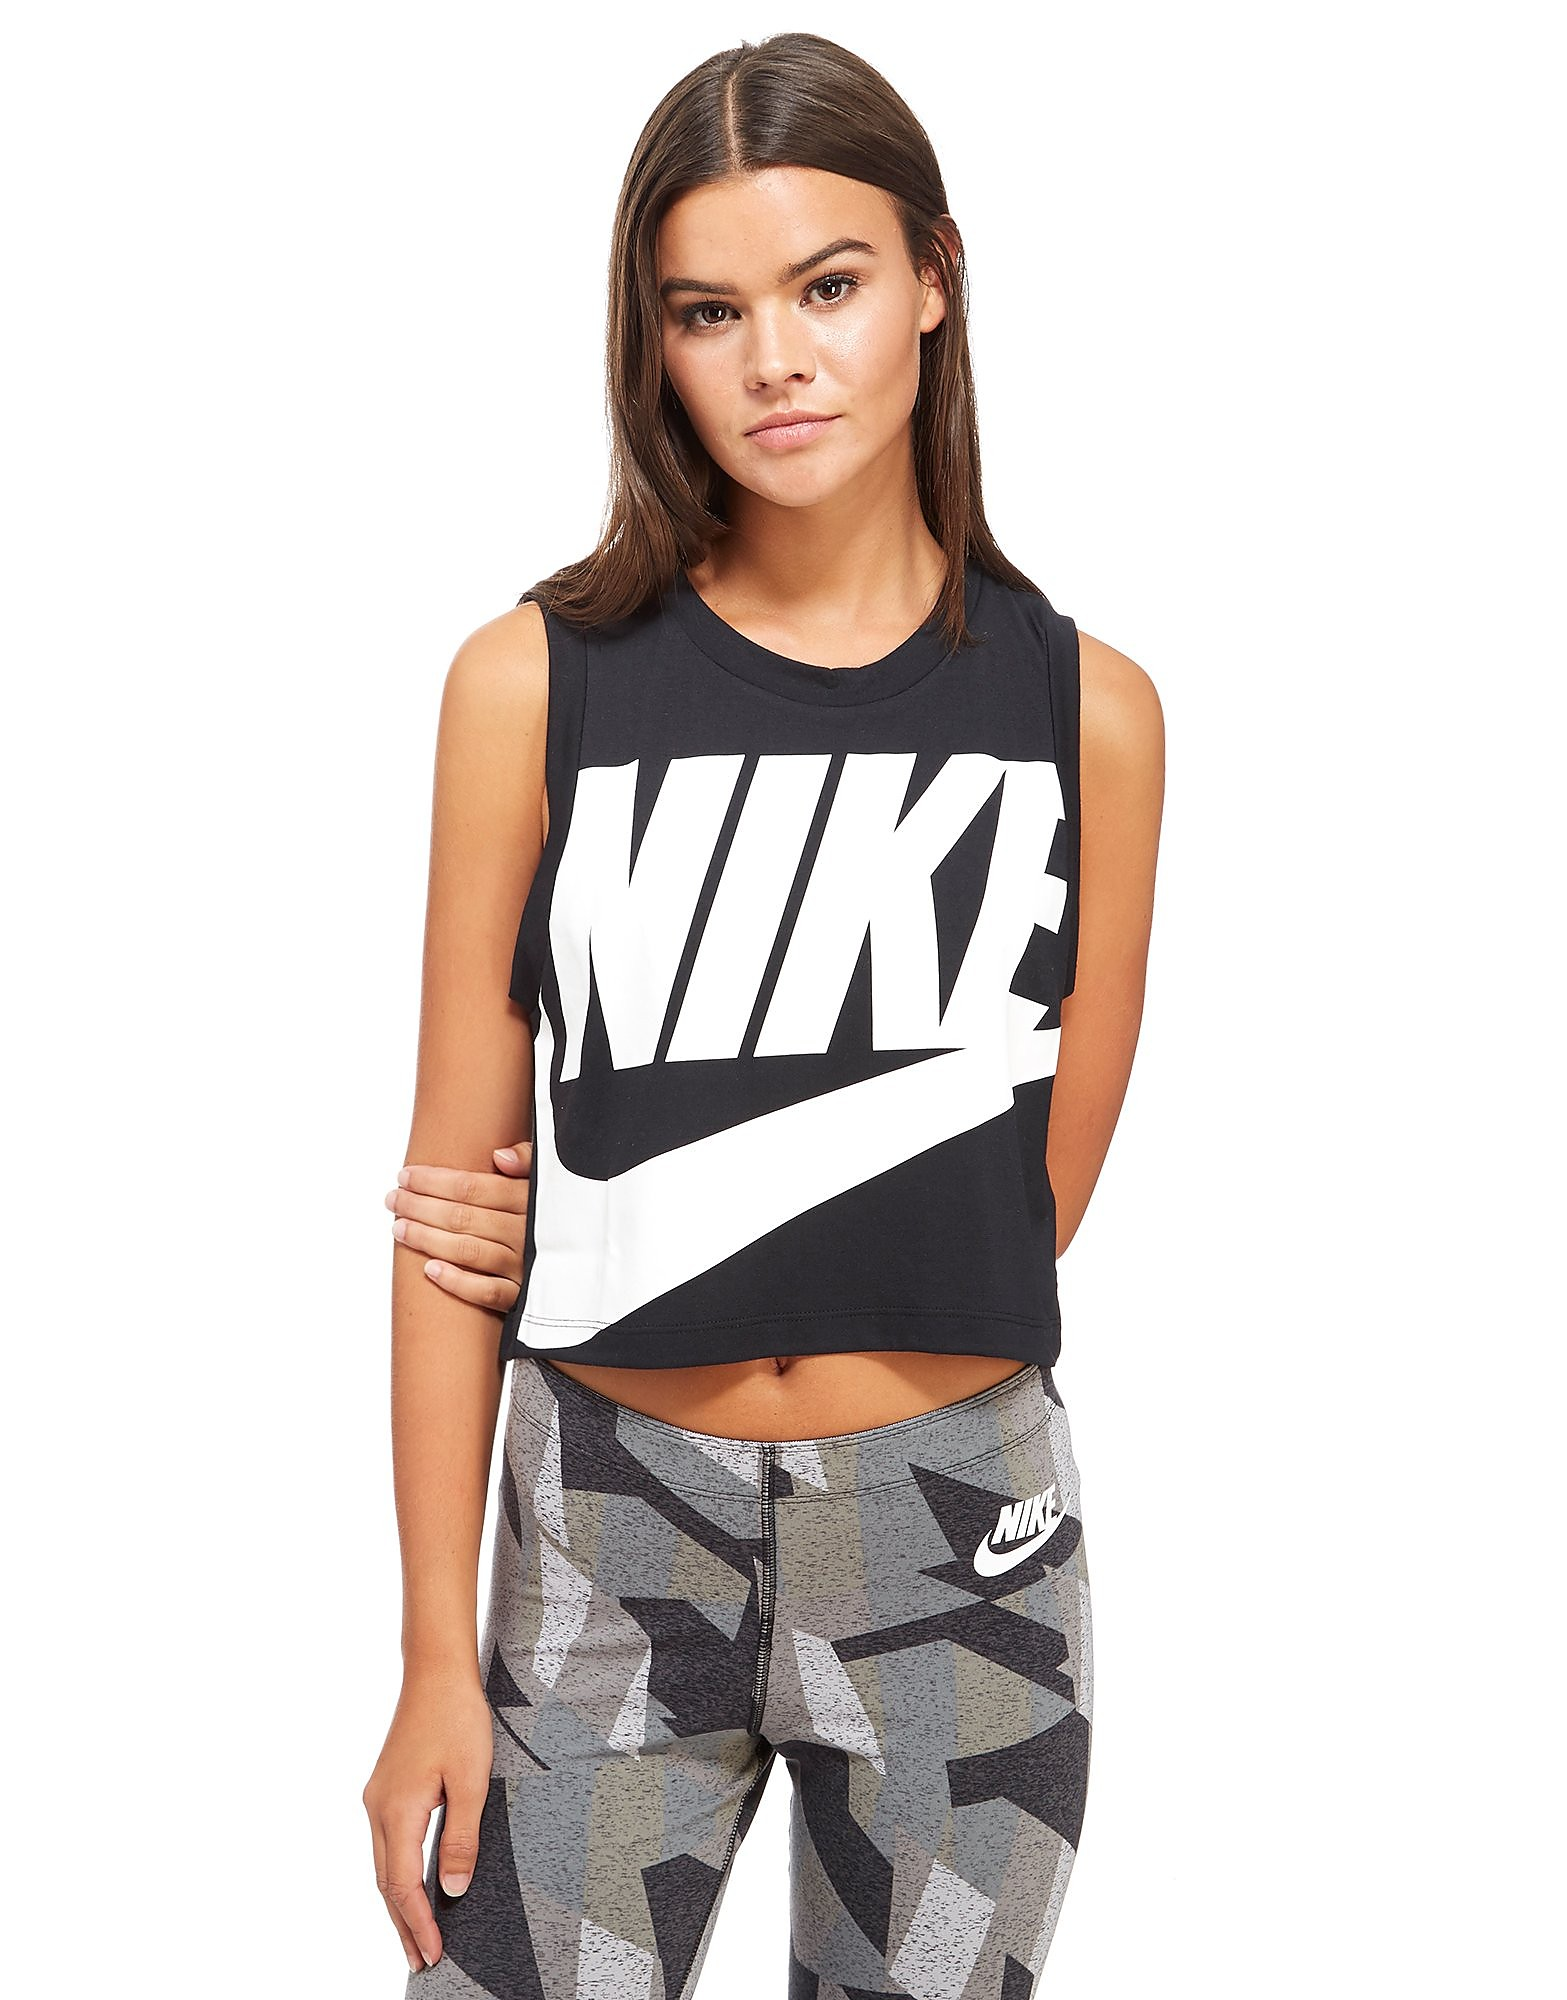 Nike Crop Sleeveless Tank